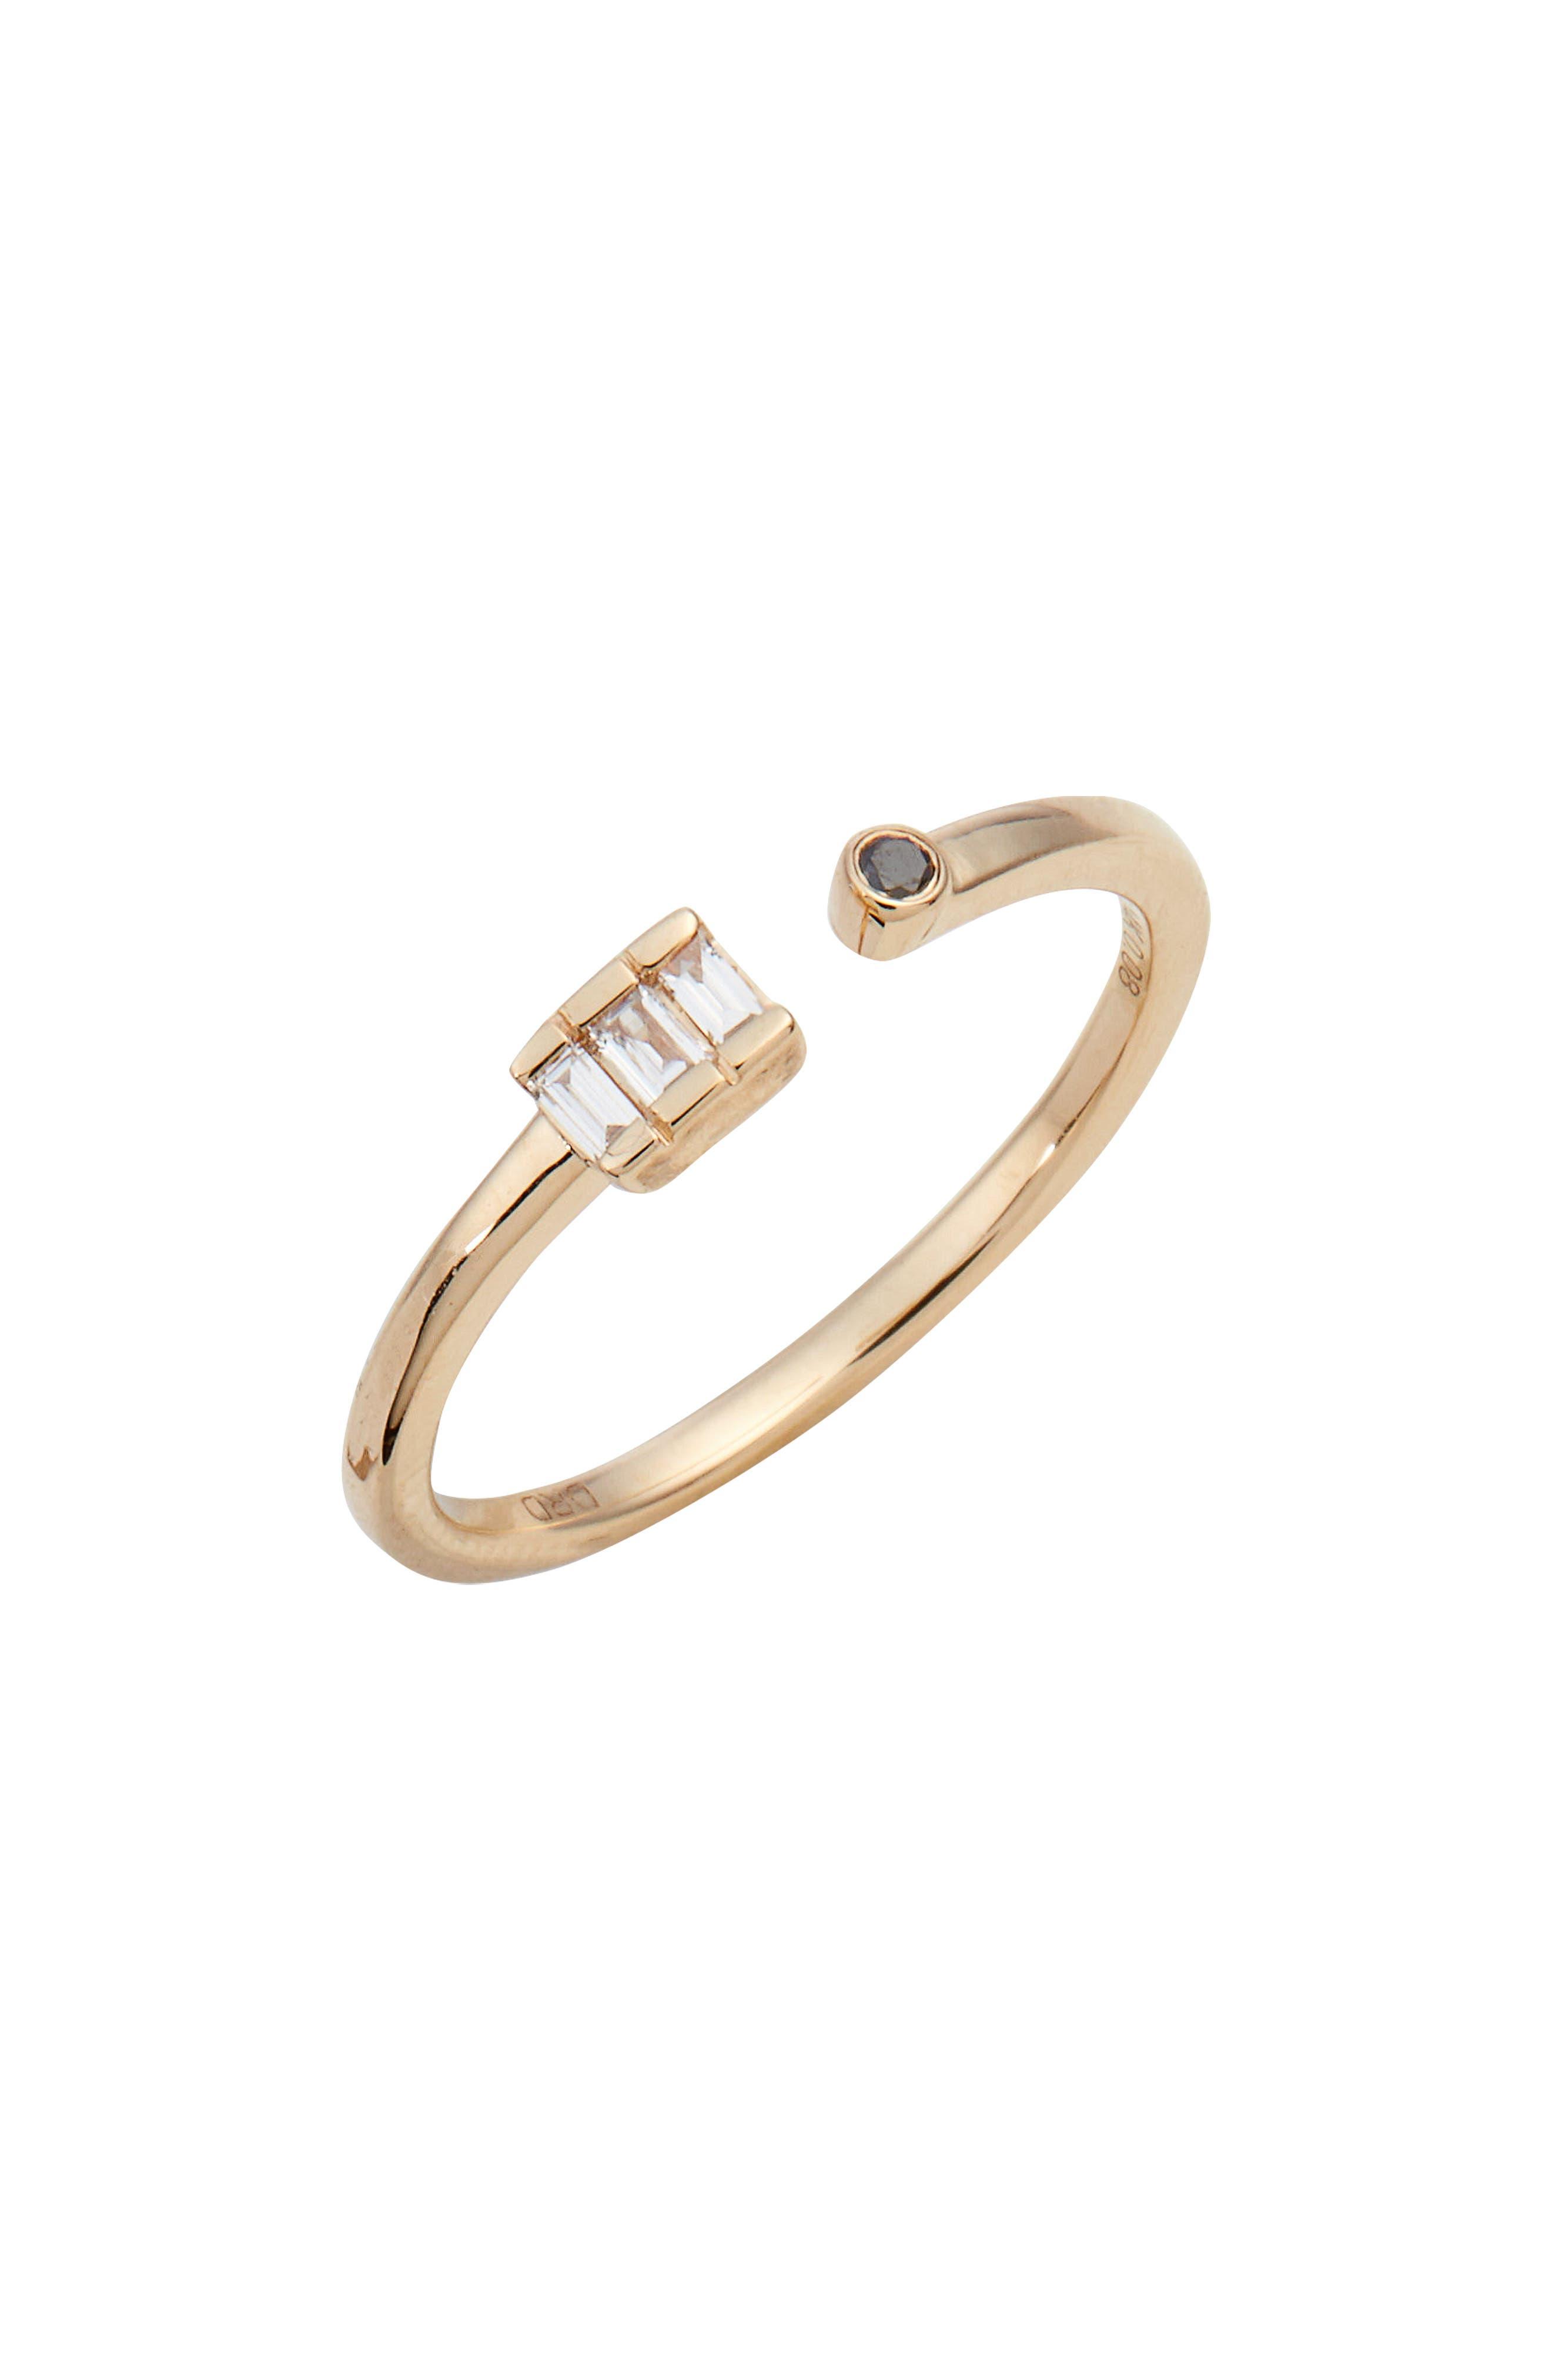 Sadie Diamond Bypass Ring,                             Main thumbnail 1, color,                             710